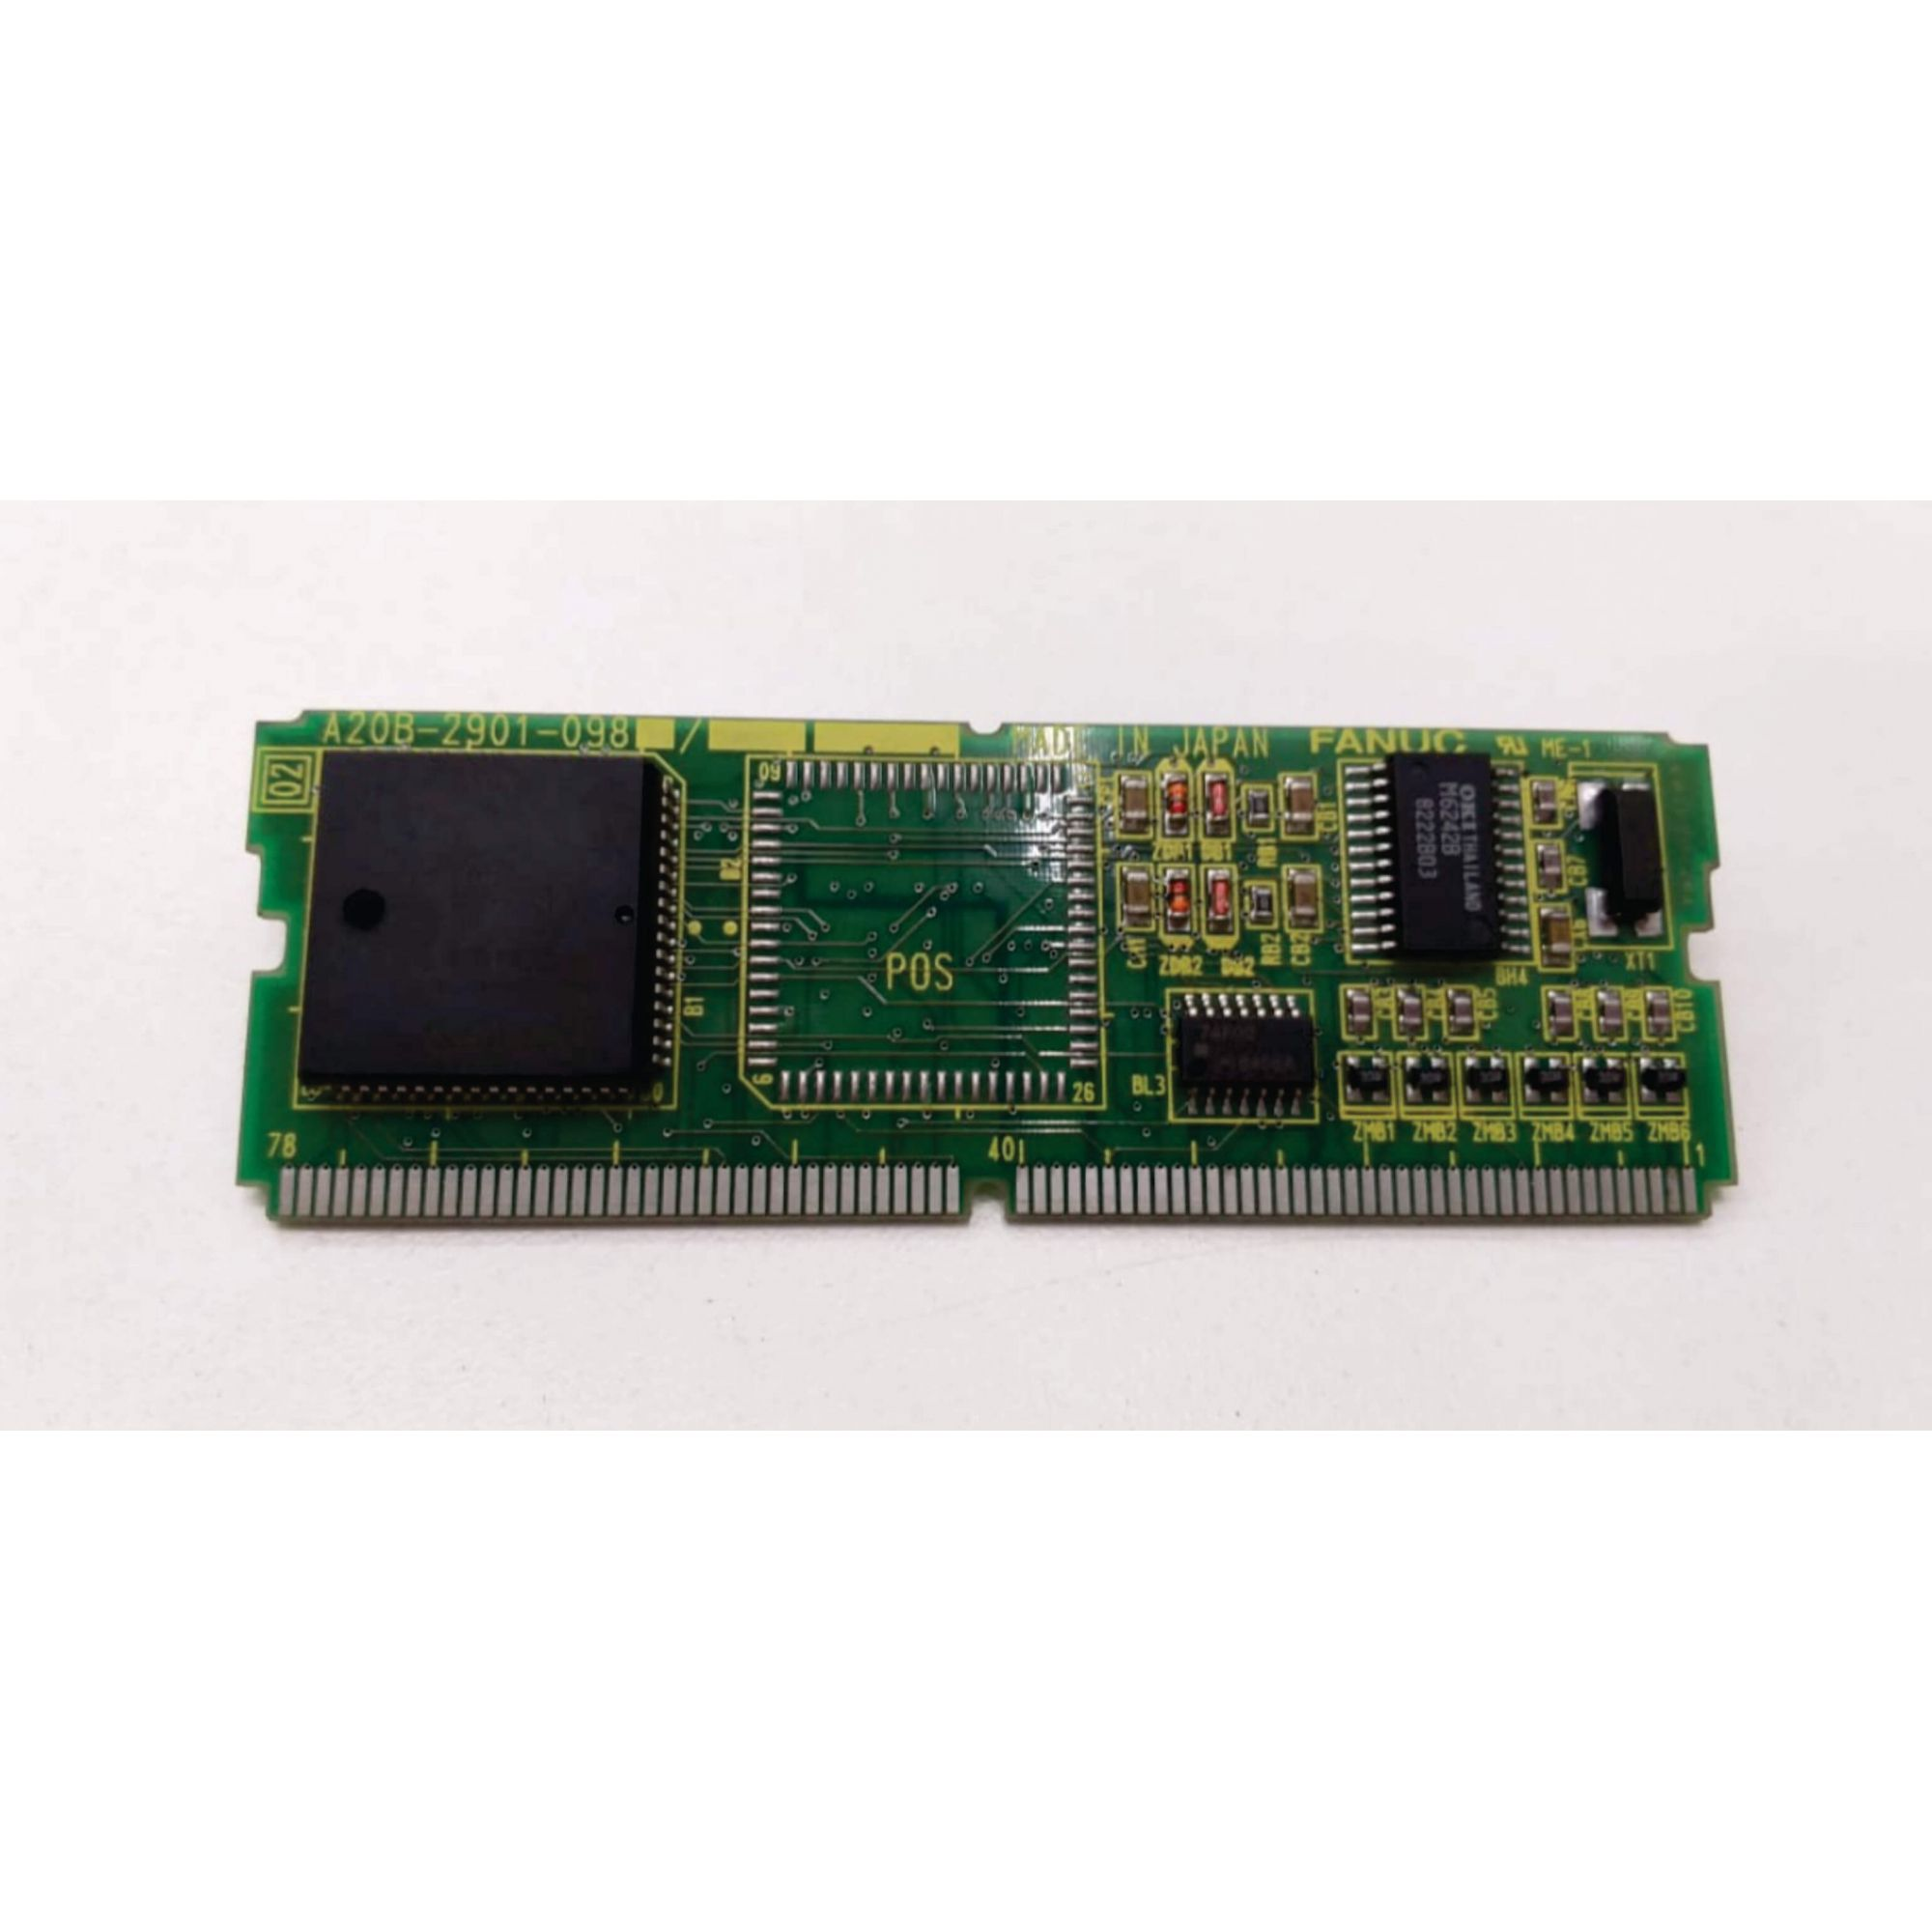 A20B-2901-0981|PLACA SPINDLE SERIAL CNC | FANUC